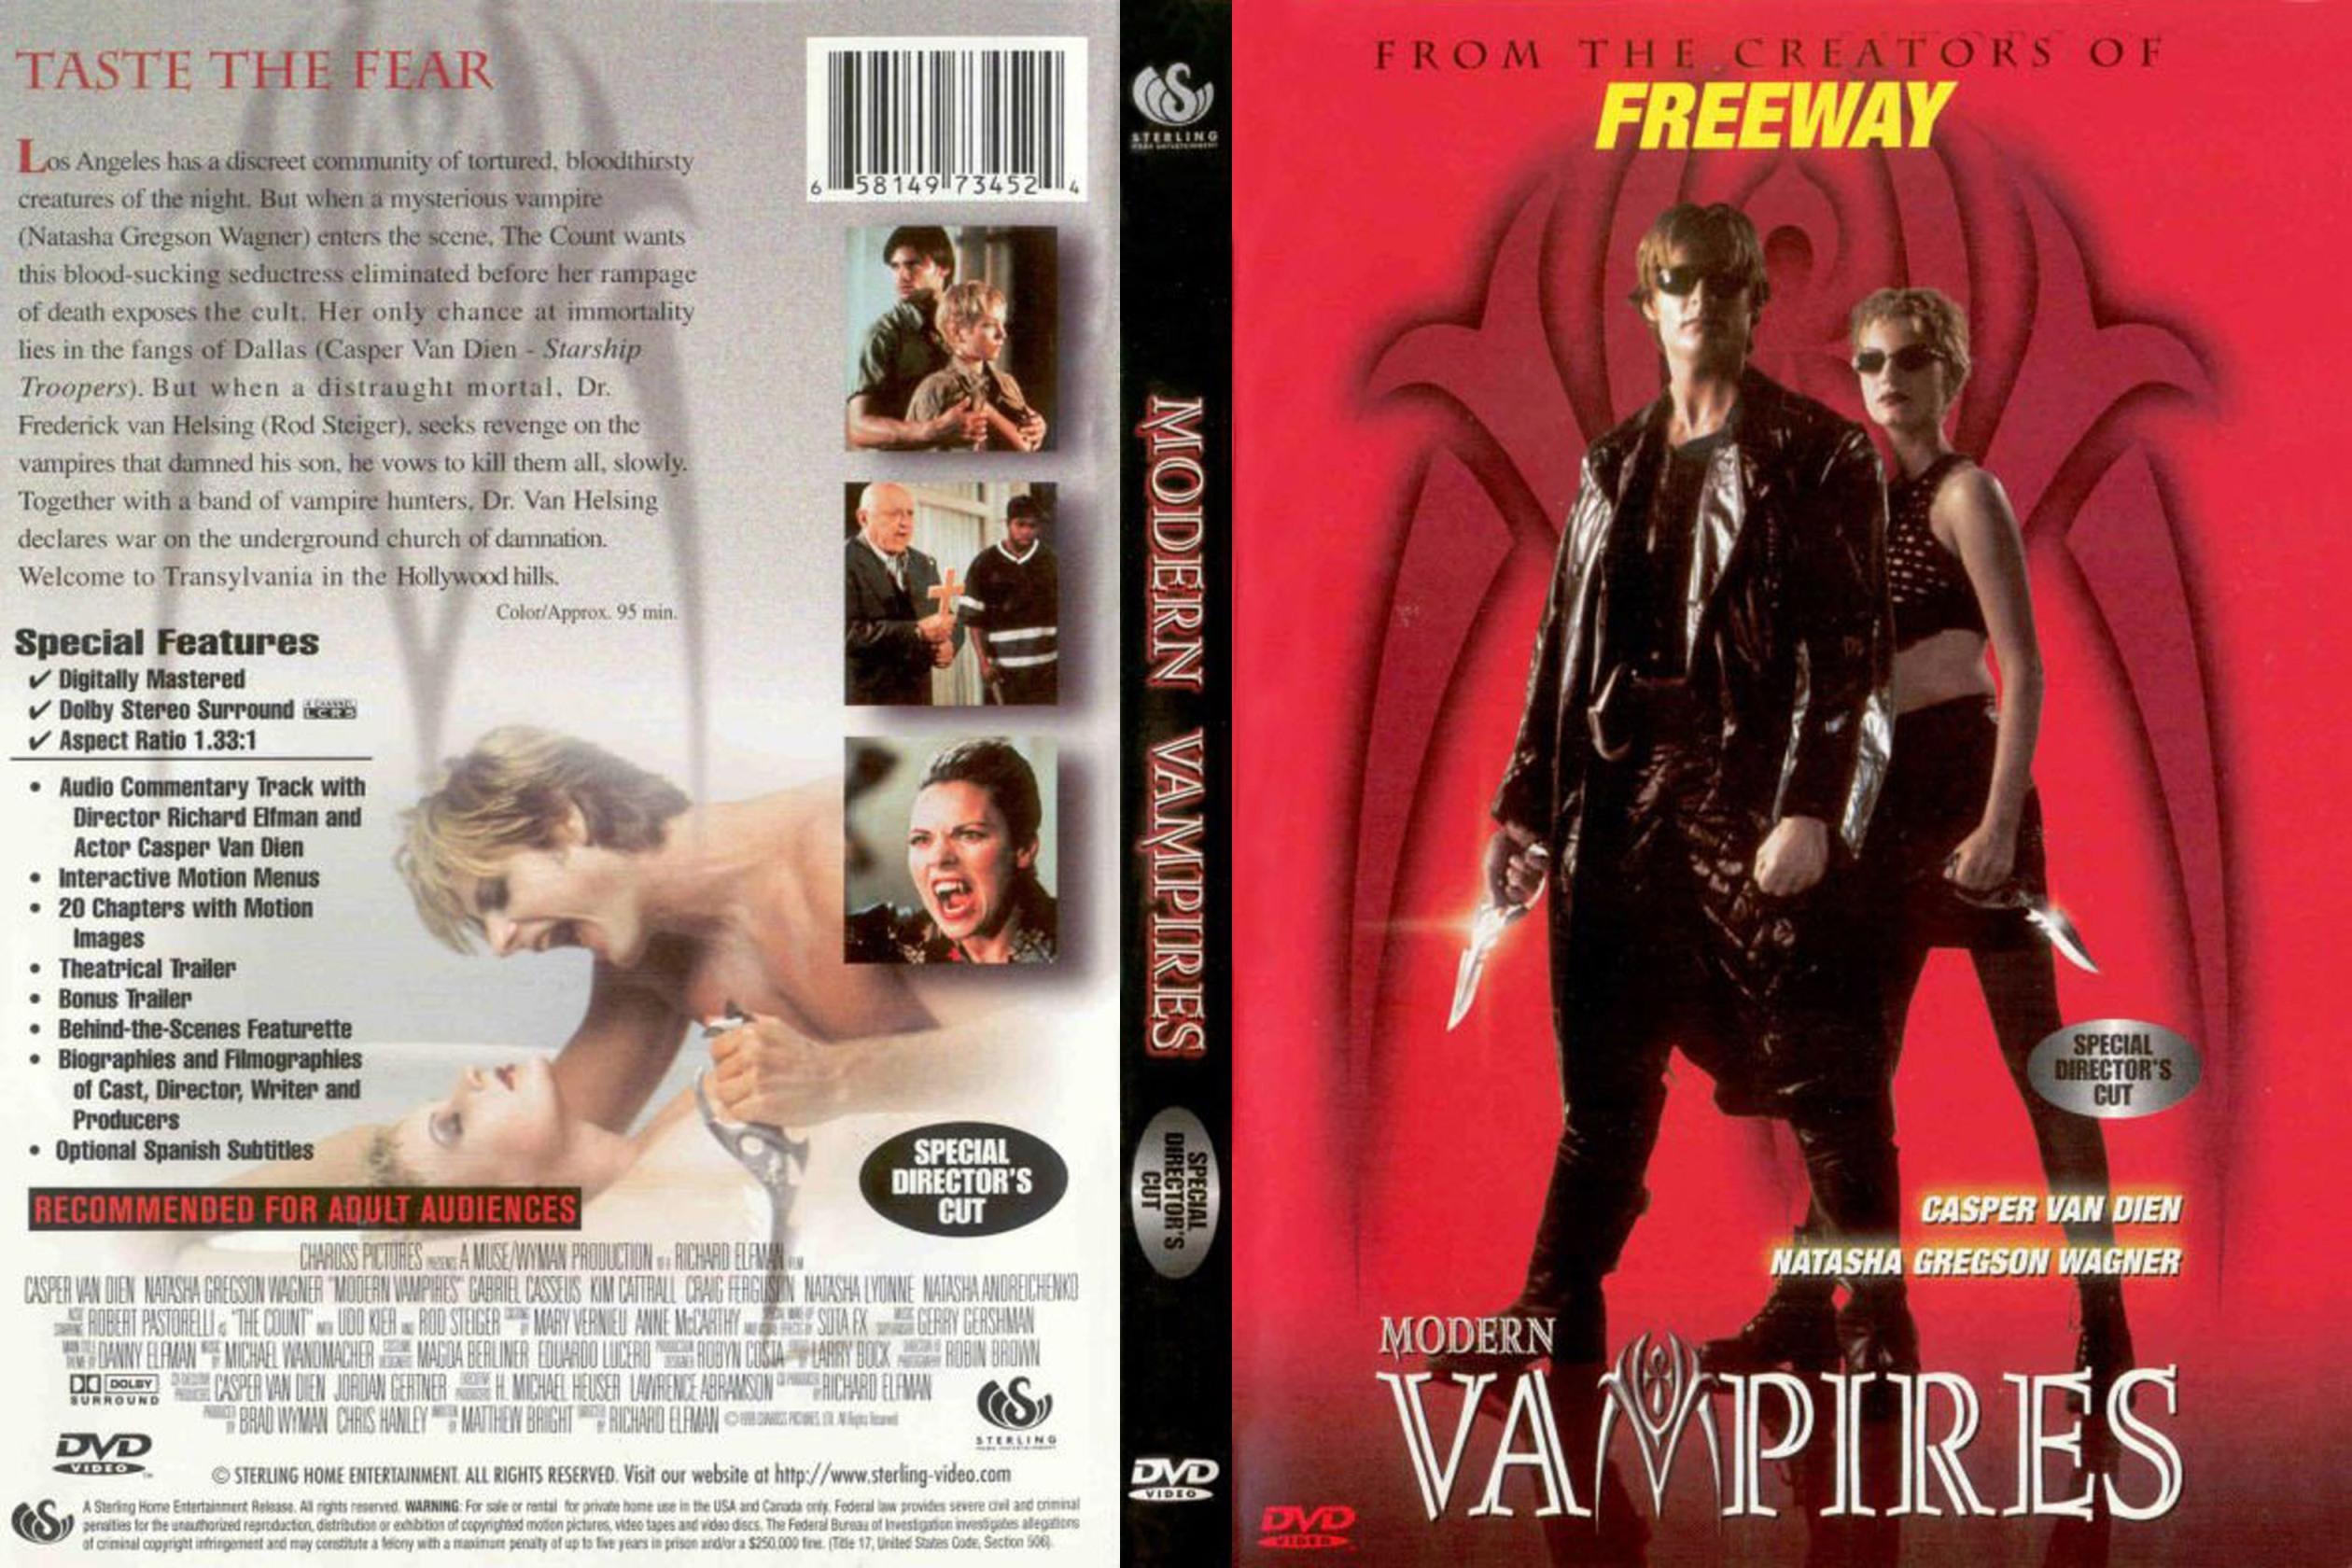 Vampires porn dvd adult picture